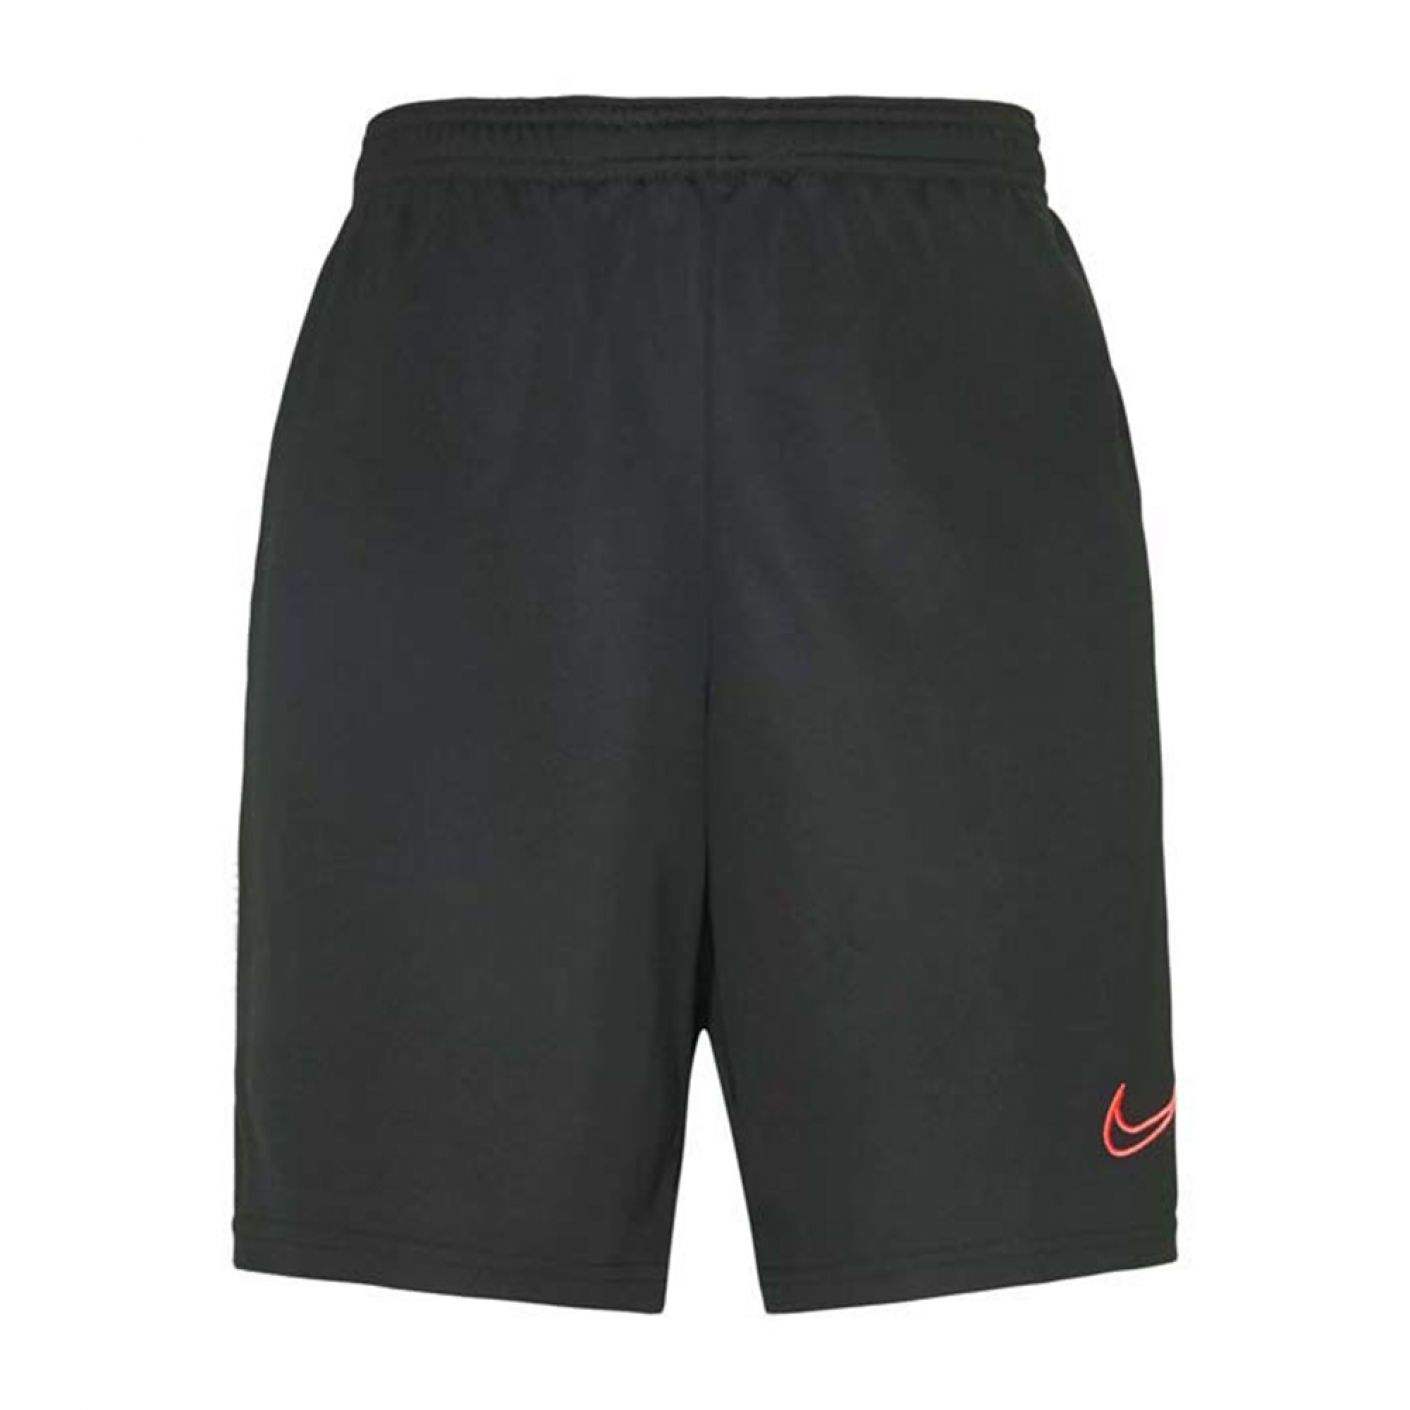 Zwart heren short Nike - CW6107-013